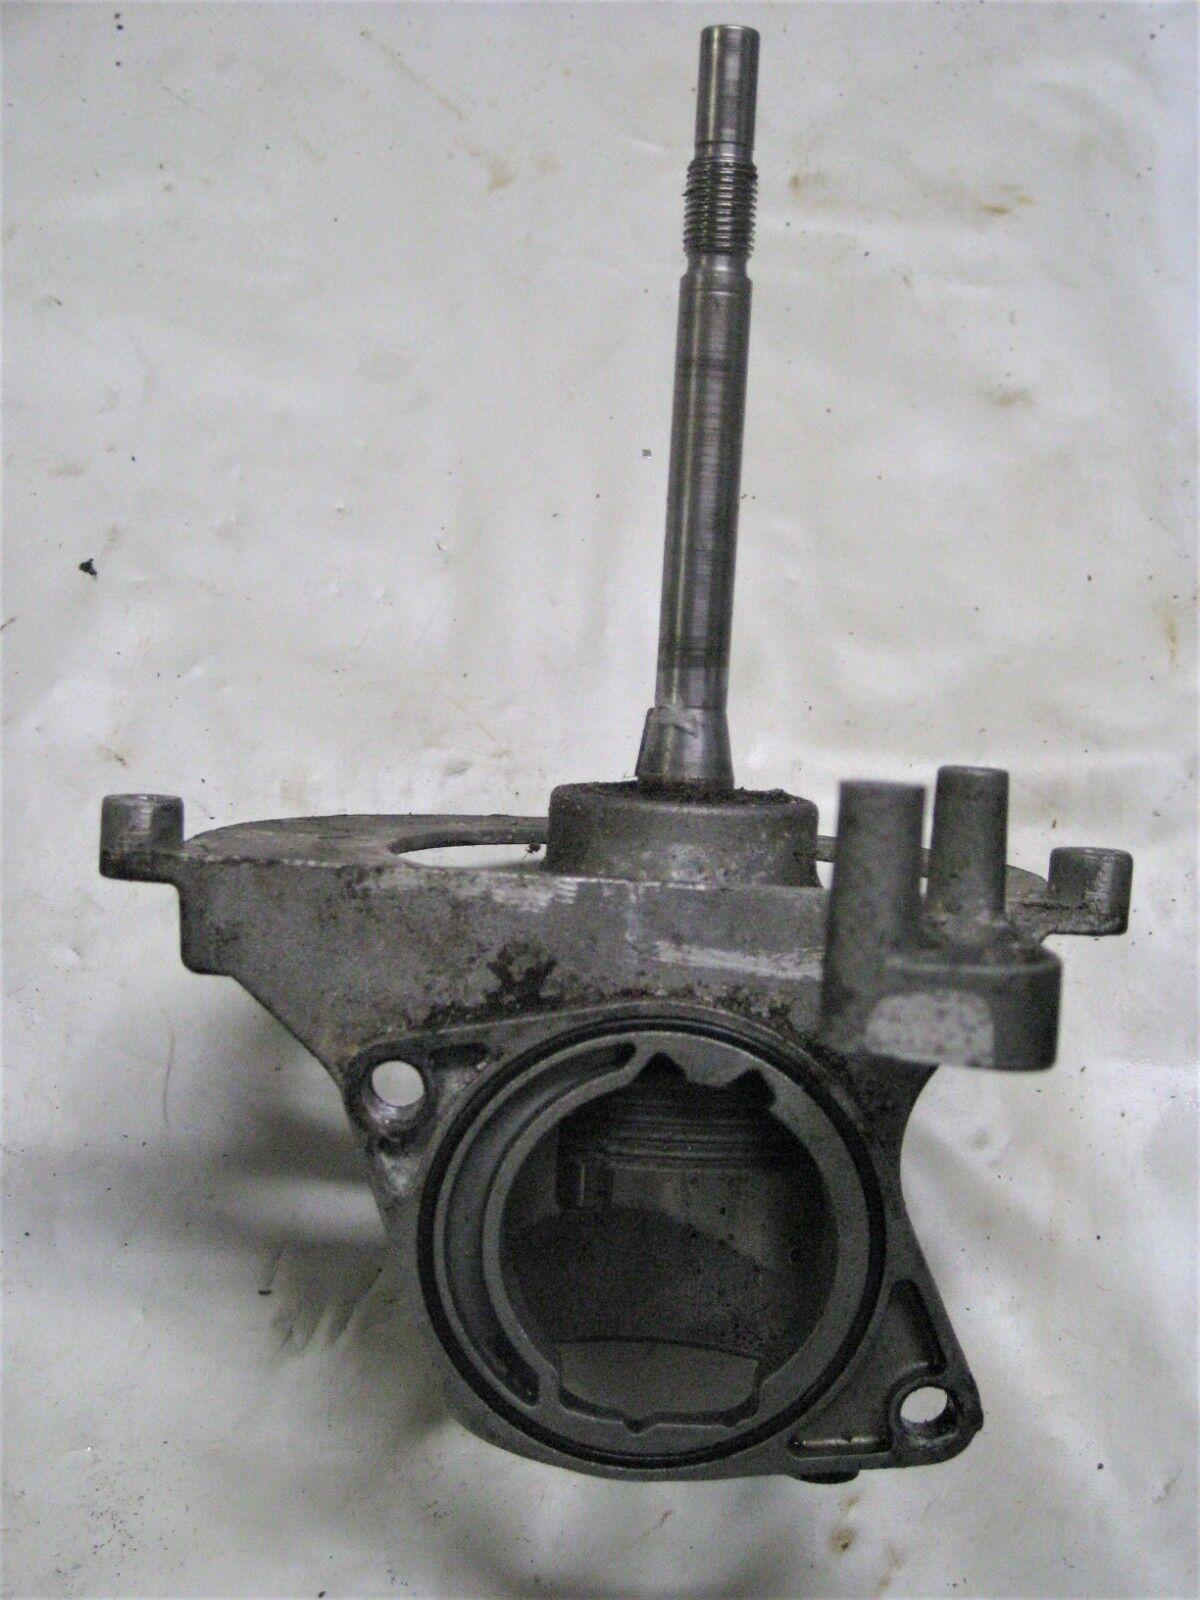 Bolens BL100 41BD100G965 Trimmer Blade Assembly Part 753-04283